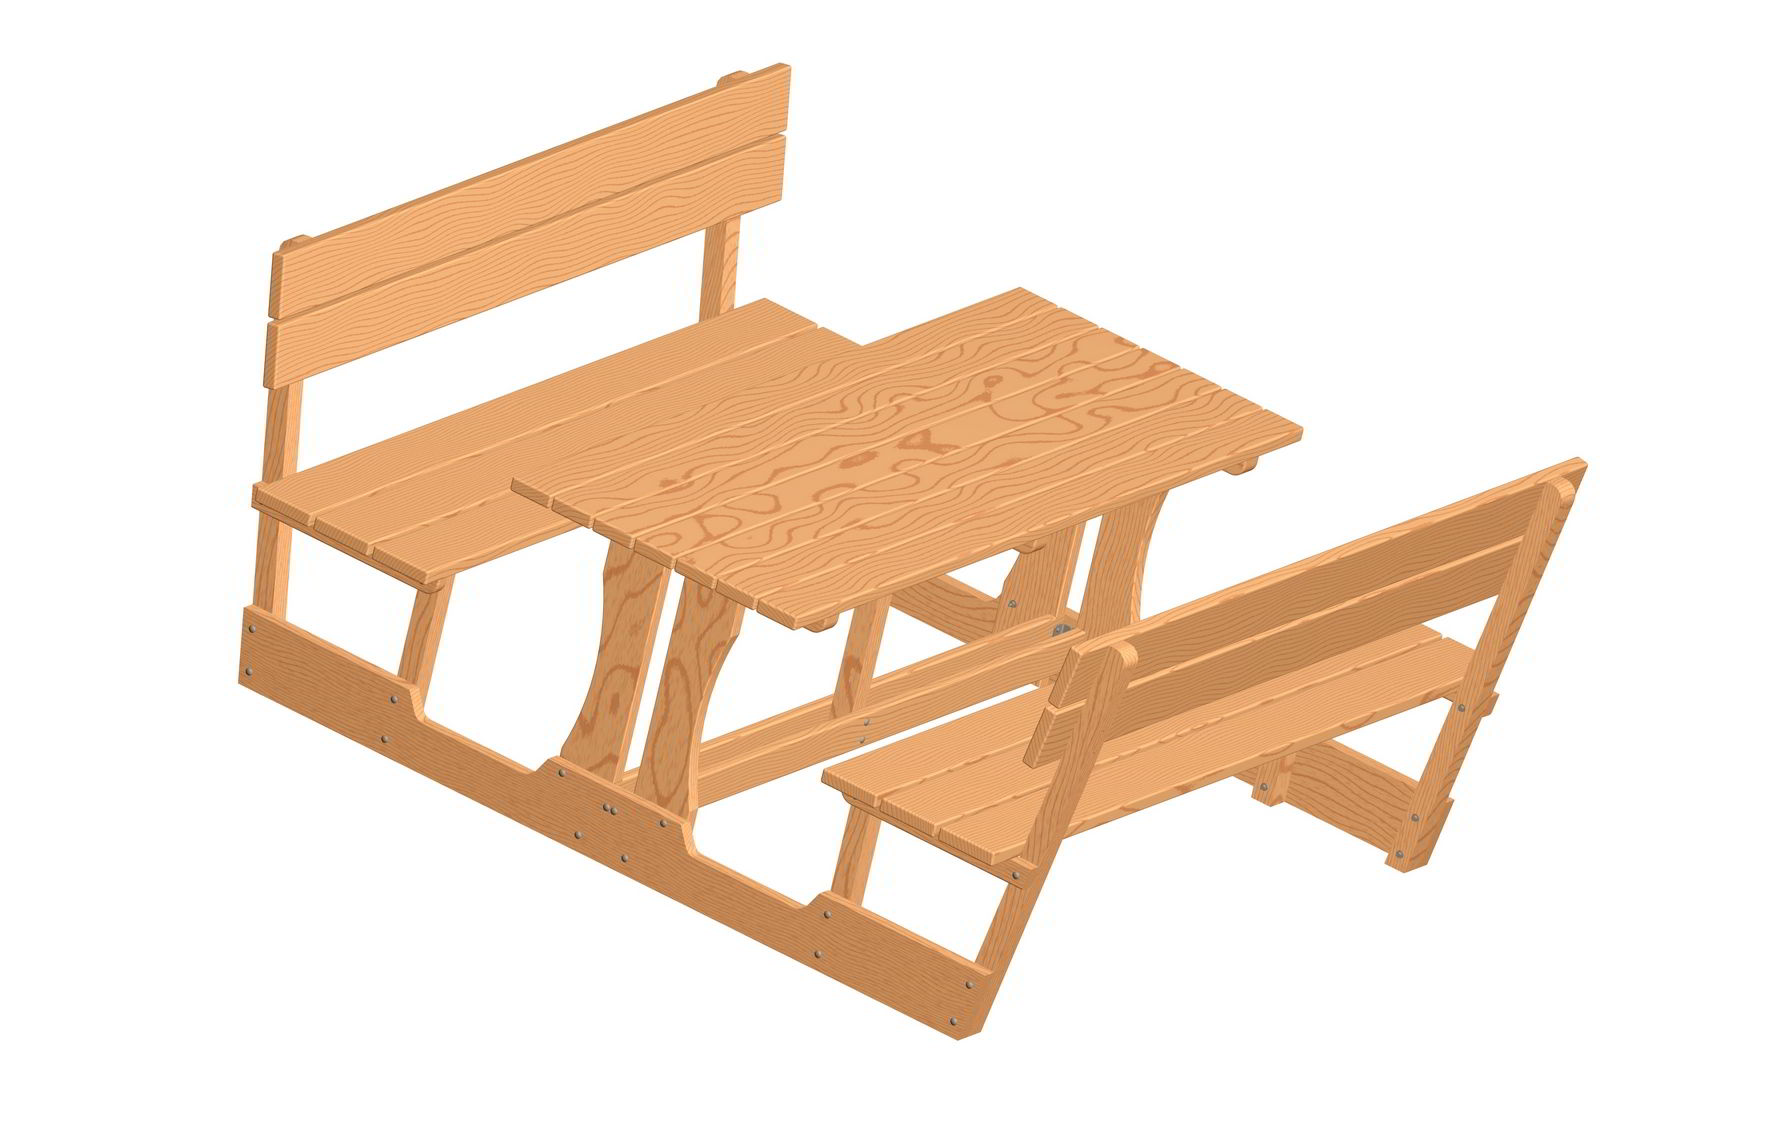 download complete plan backyard seating set plan 5 62mb pdf backyard